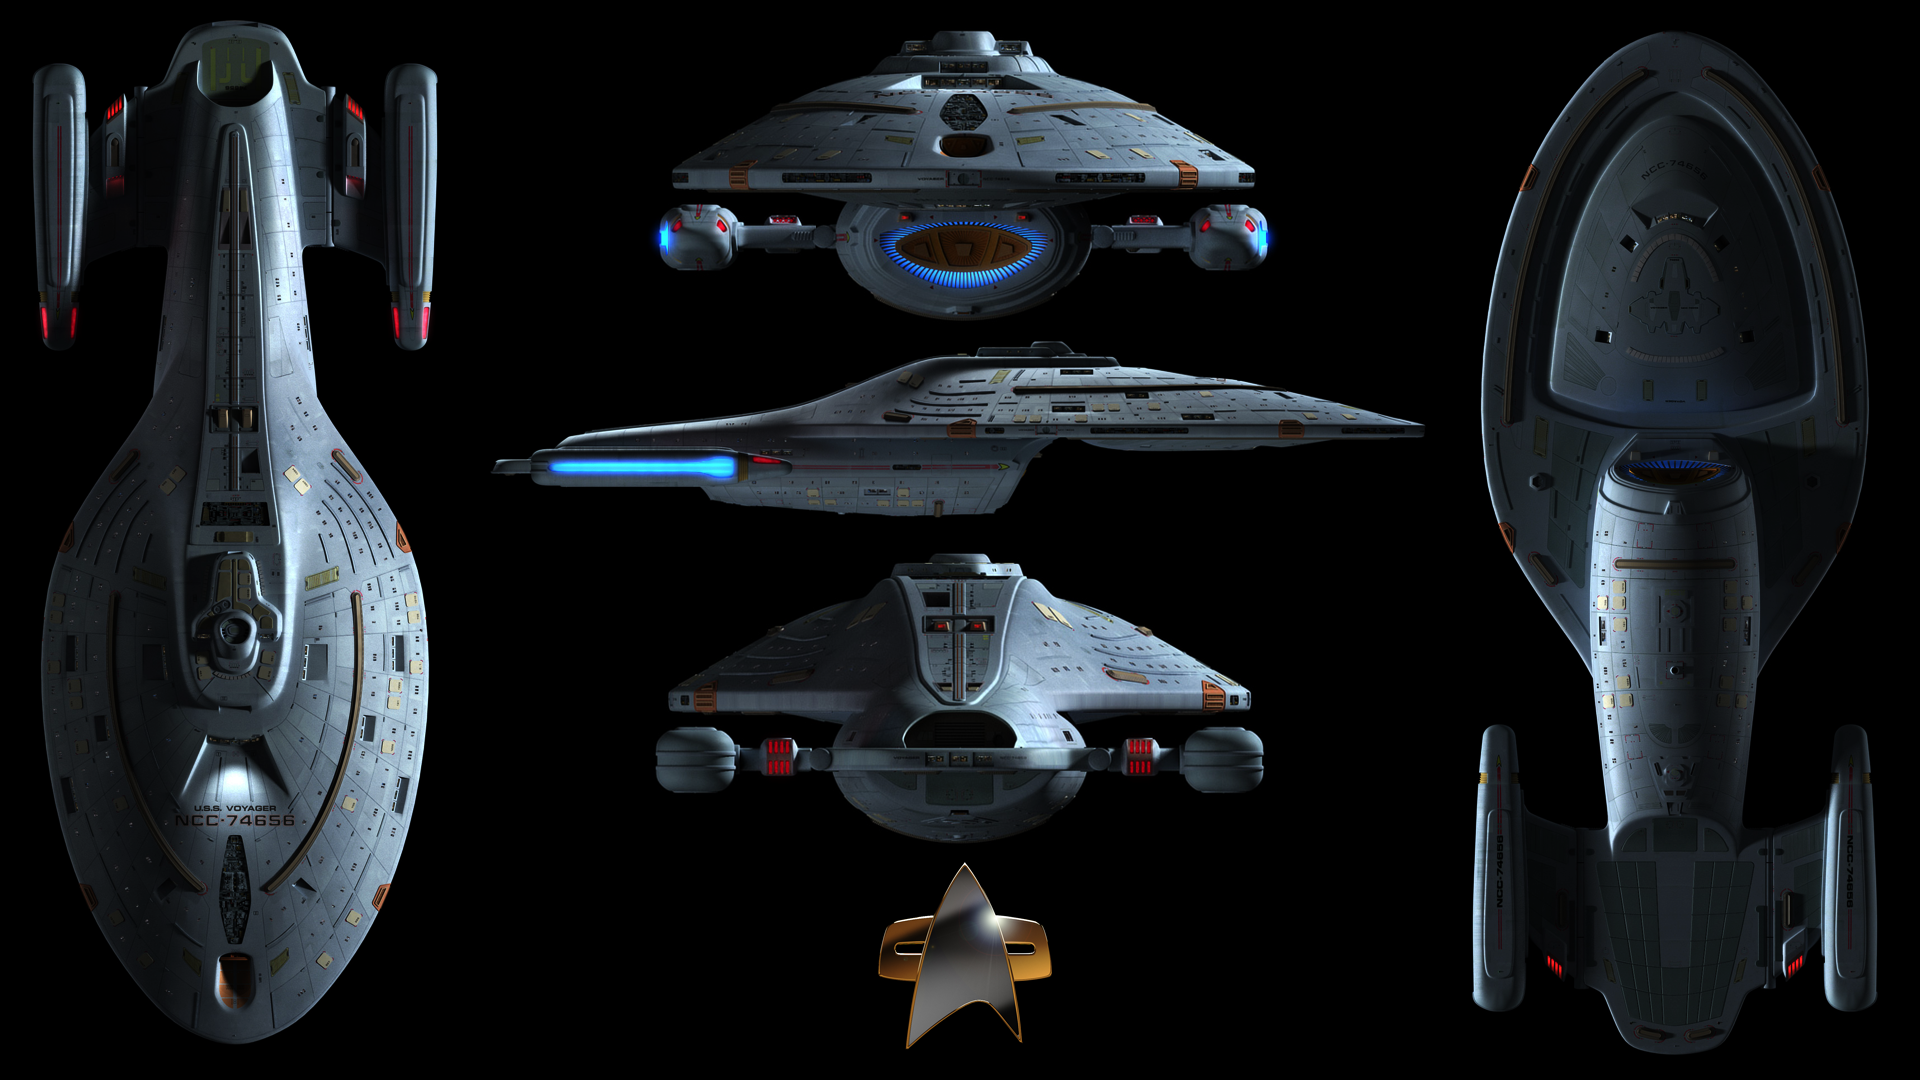 Uss Voyager Wallpaper By Spirit Of Adventure On Deviantart